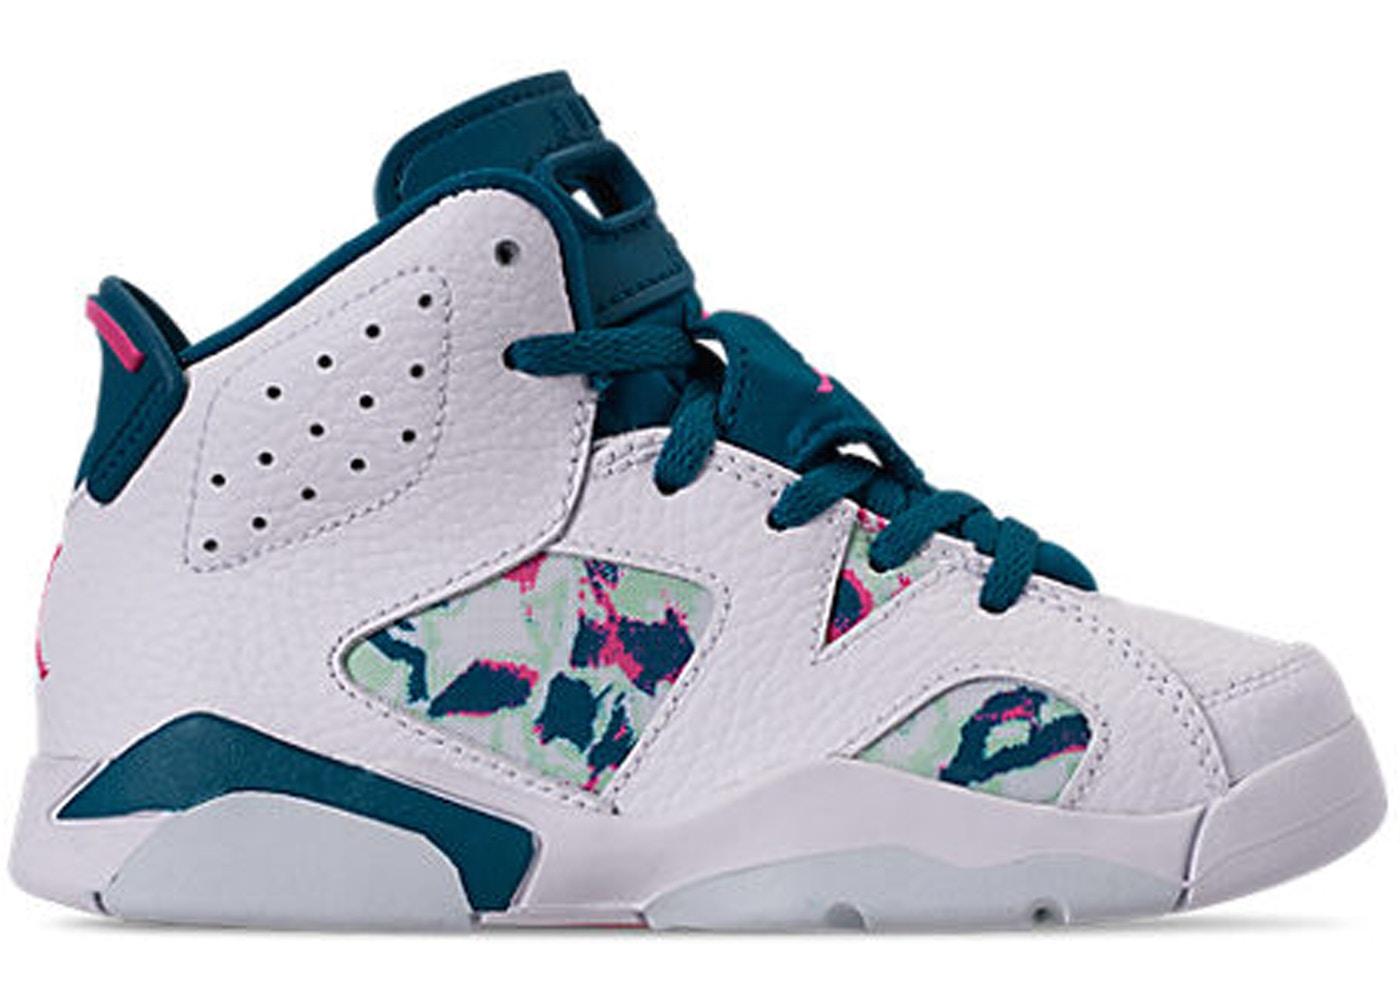 huge discount 834a0 8c7fd Air Jordan 6 Shoes - Release Date